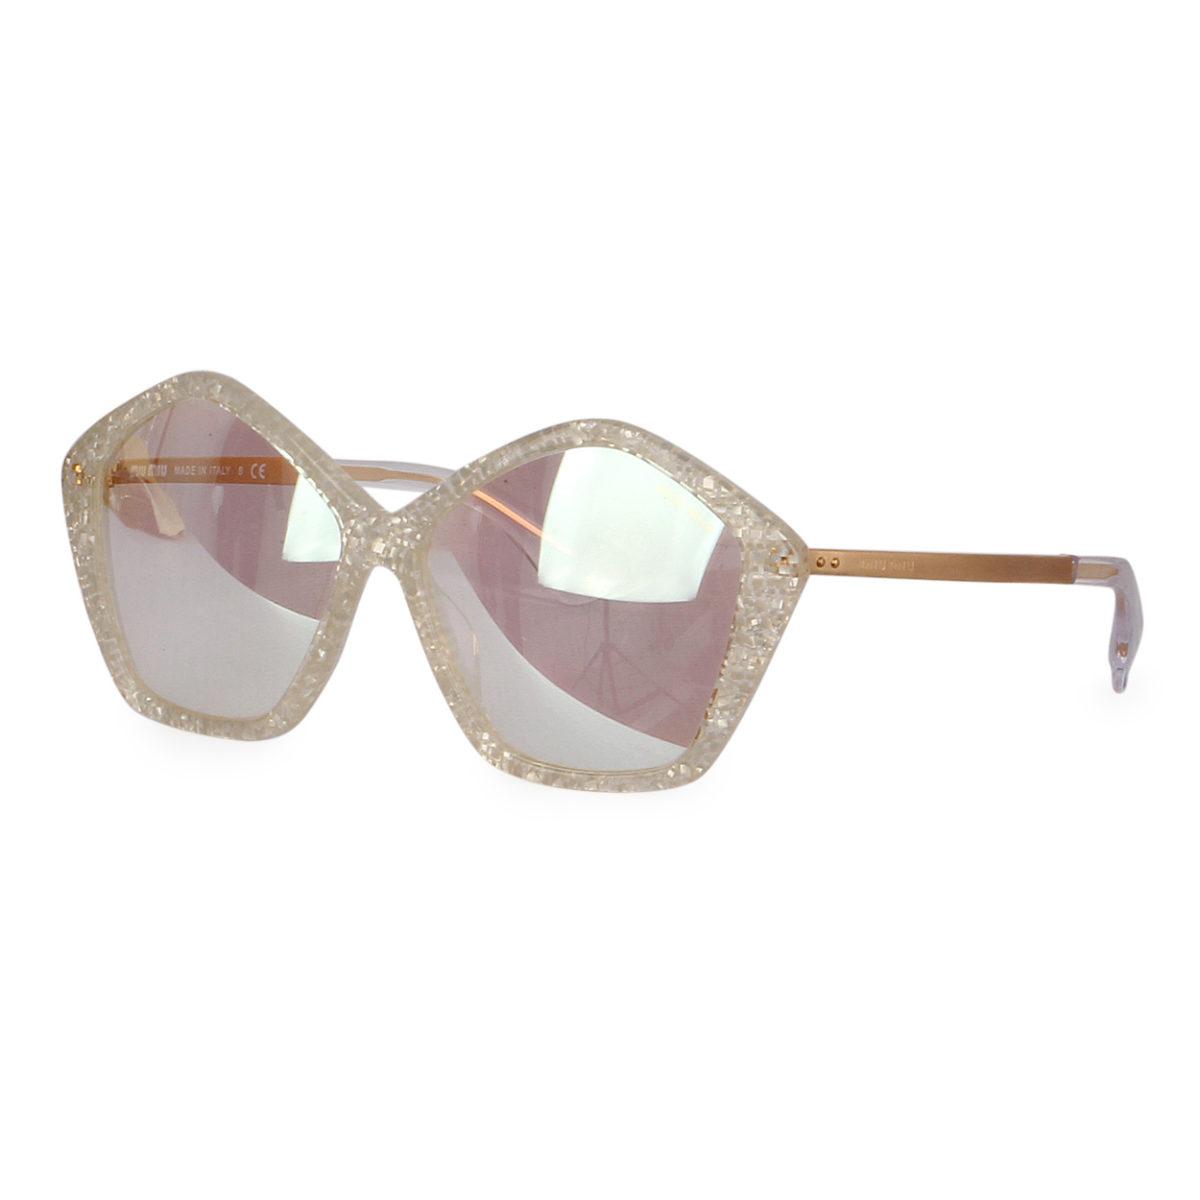 9b84194916c MIU MIU Sunglasses SMU 11N Reflective Crystal